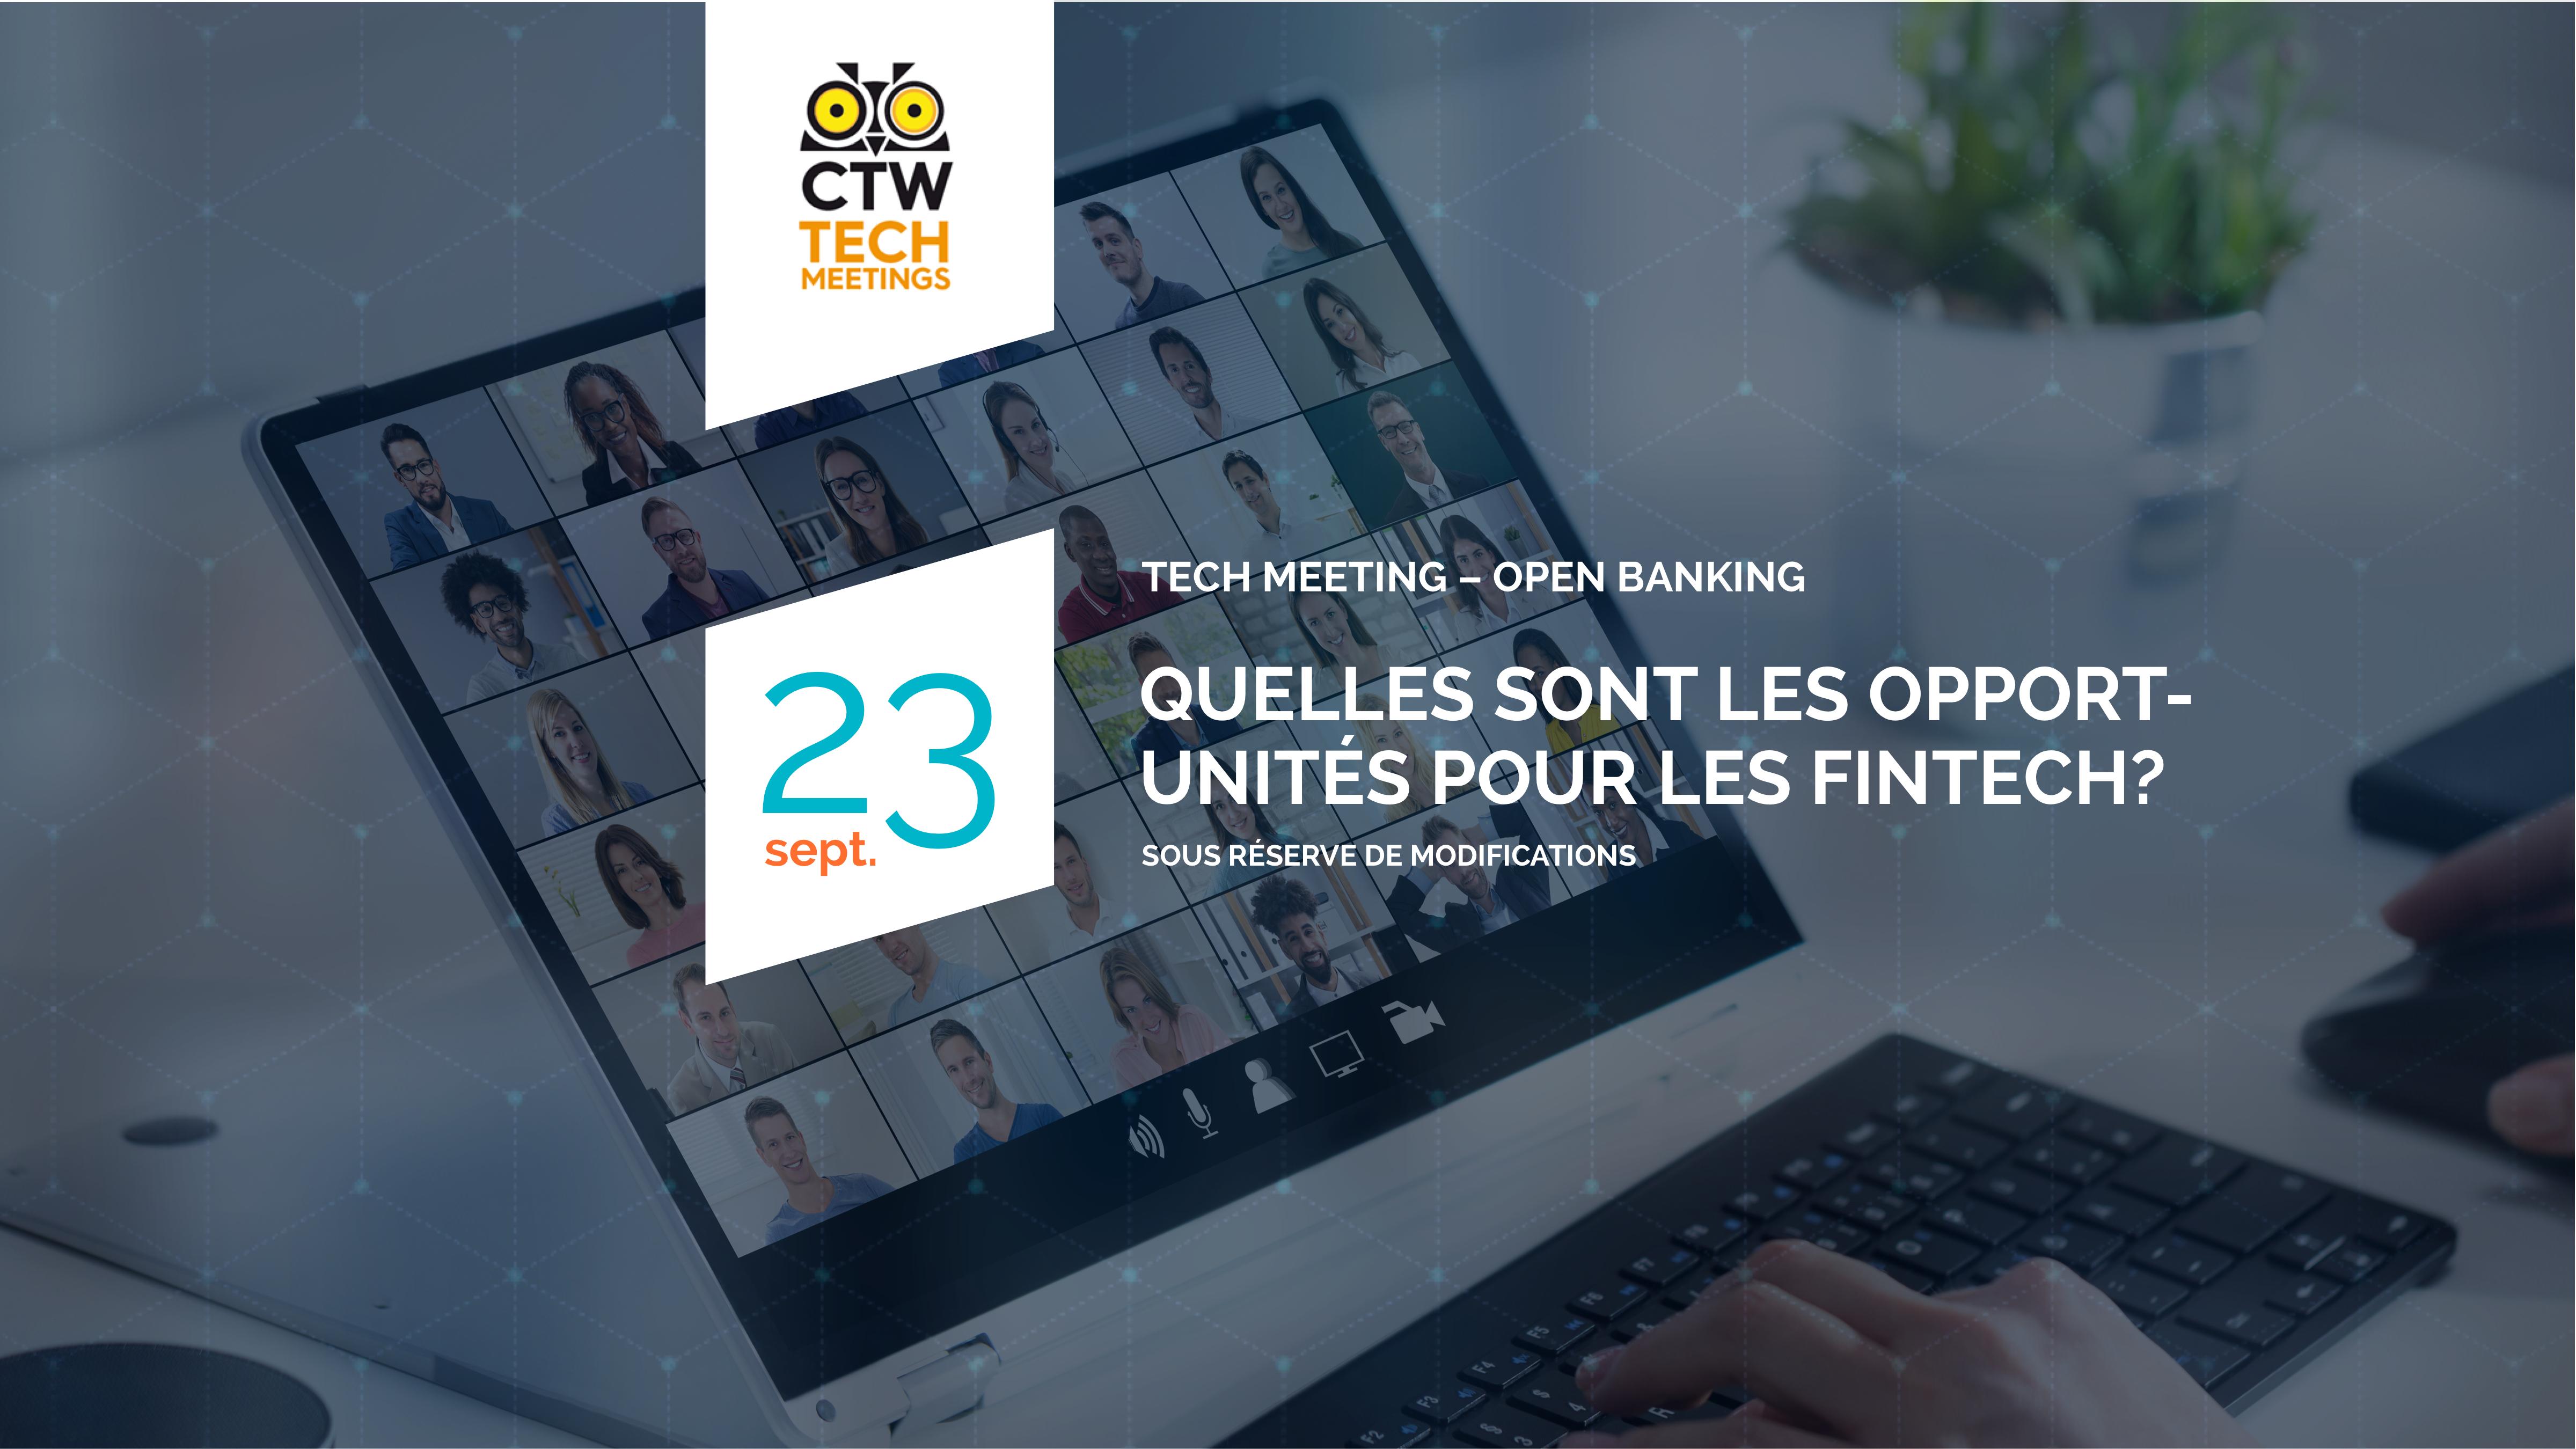 Tech Meeting - Open Banking